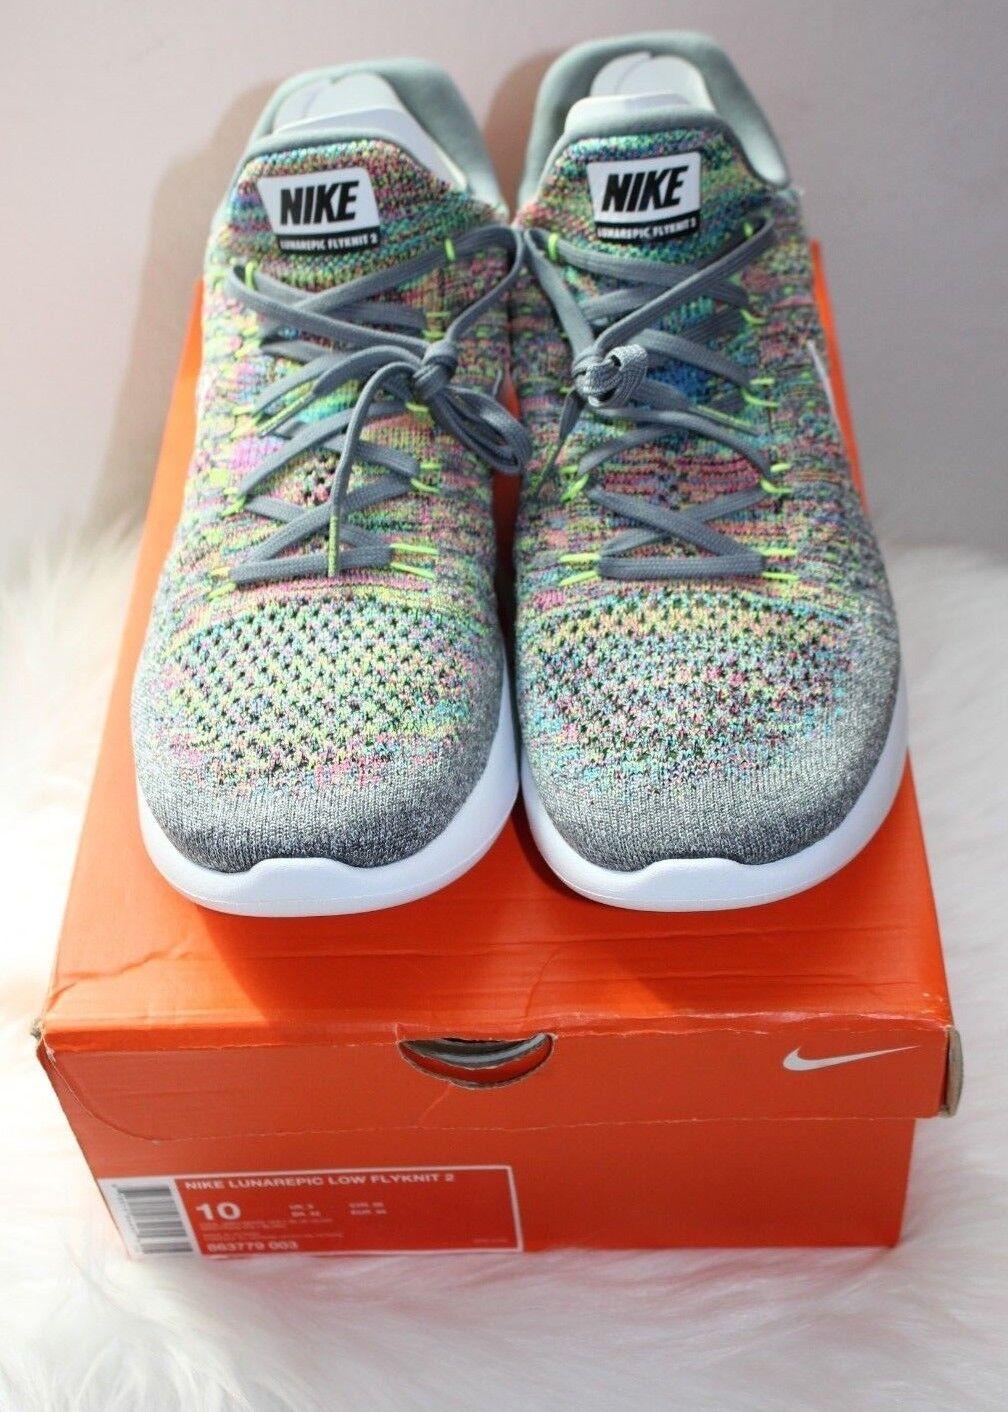 Nike Men's Lunarepic Low Flyknit 2 Cool Grey White-Volt-blueee Glow (863779 003)